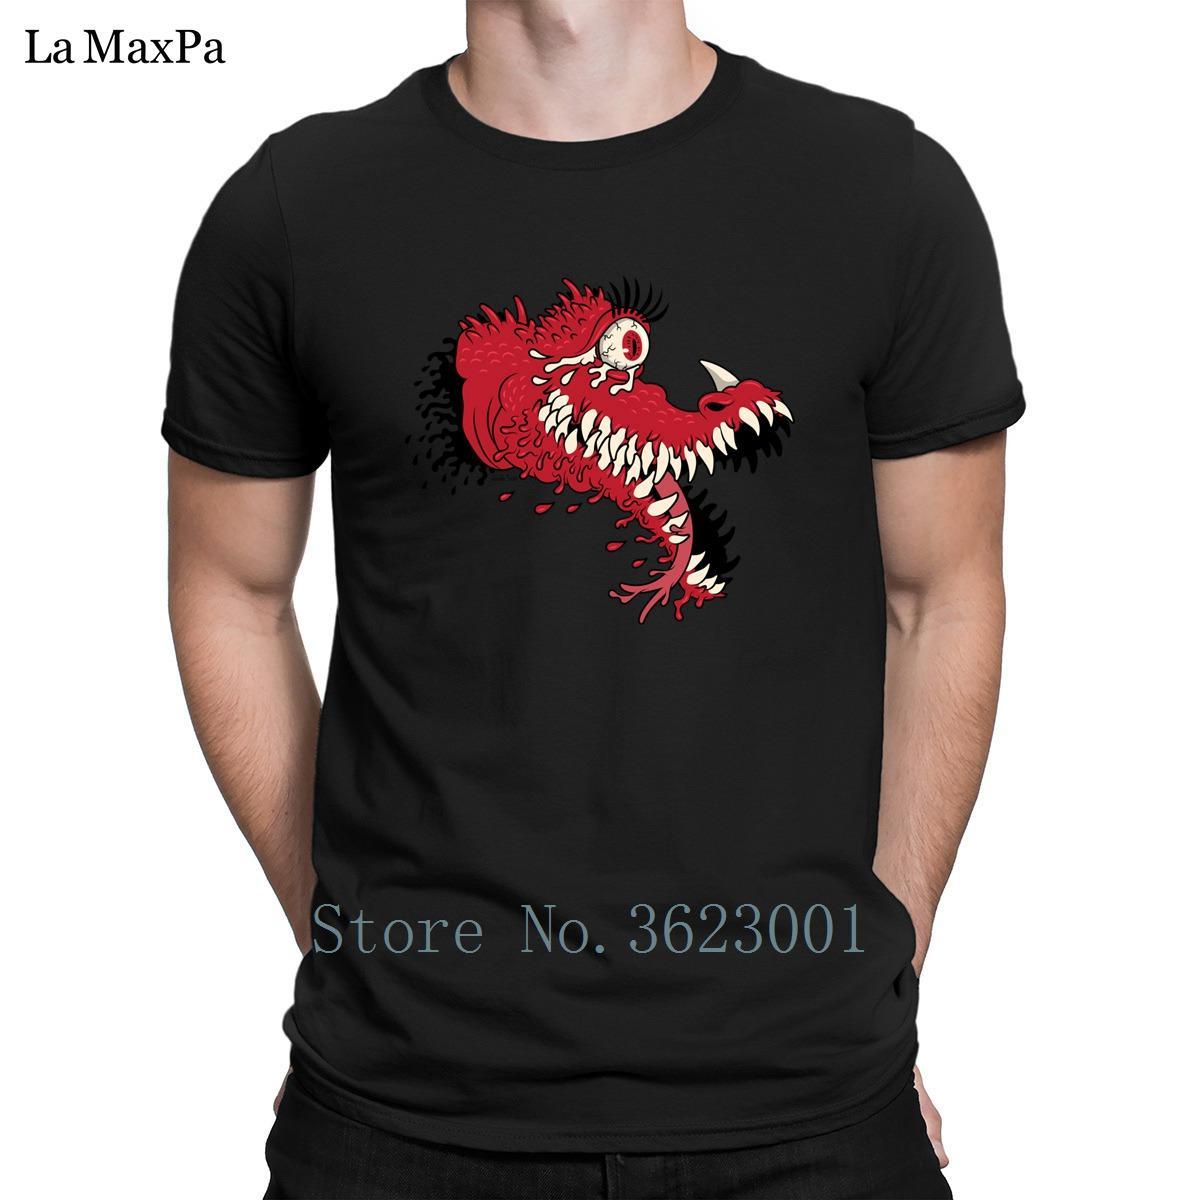 Подгонянная нормальная футболка одежда One Eyed Blood Beast мужская футболка удобная фирменная мужская футболка O-образным вырезом свободная футболка